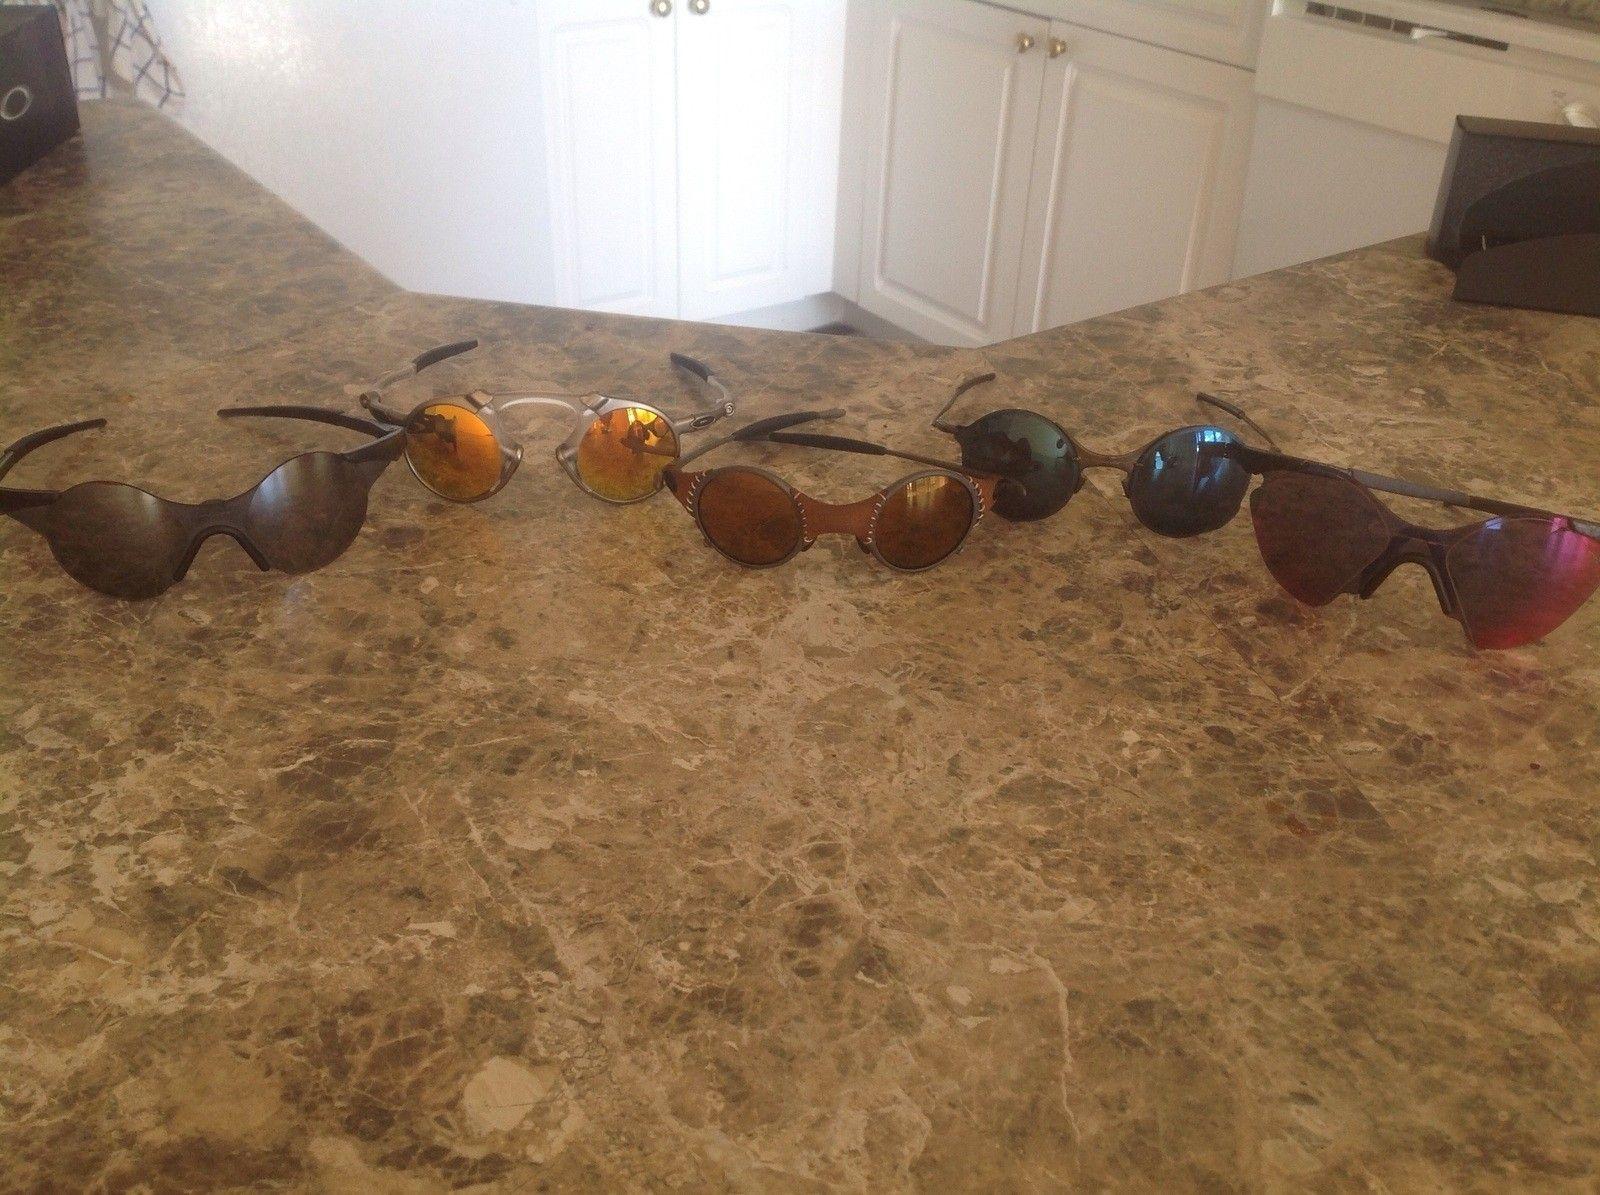 Round glasses rule! - image.jpg